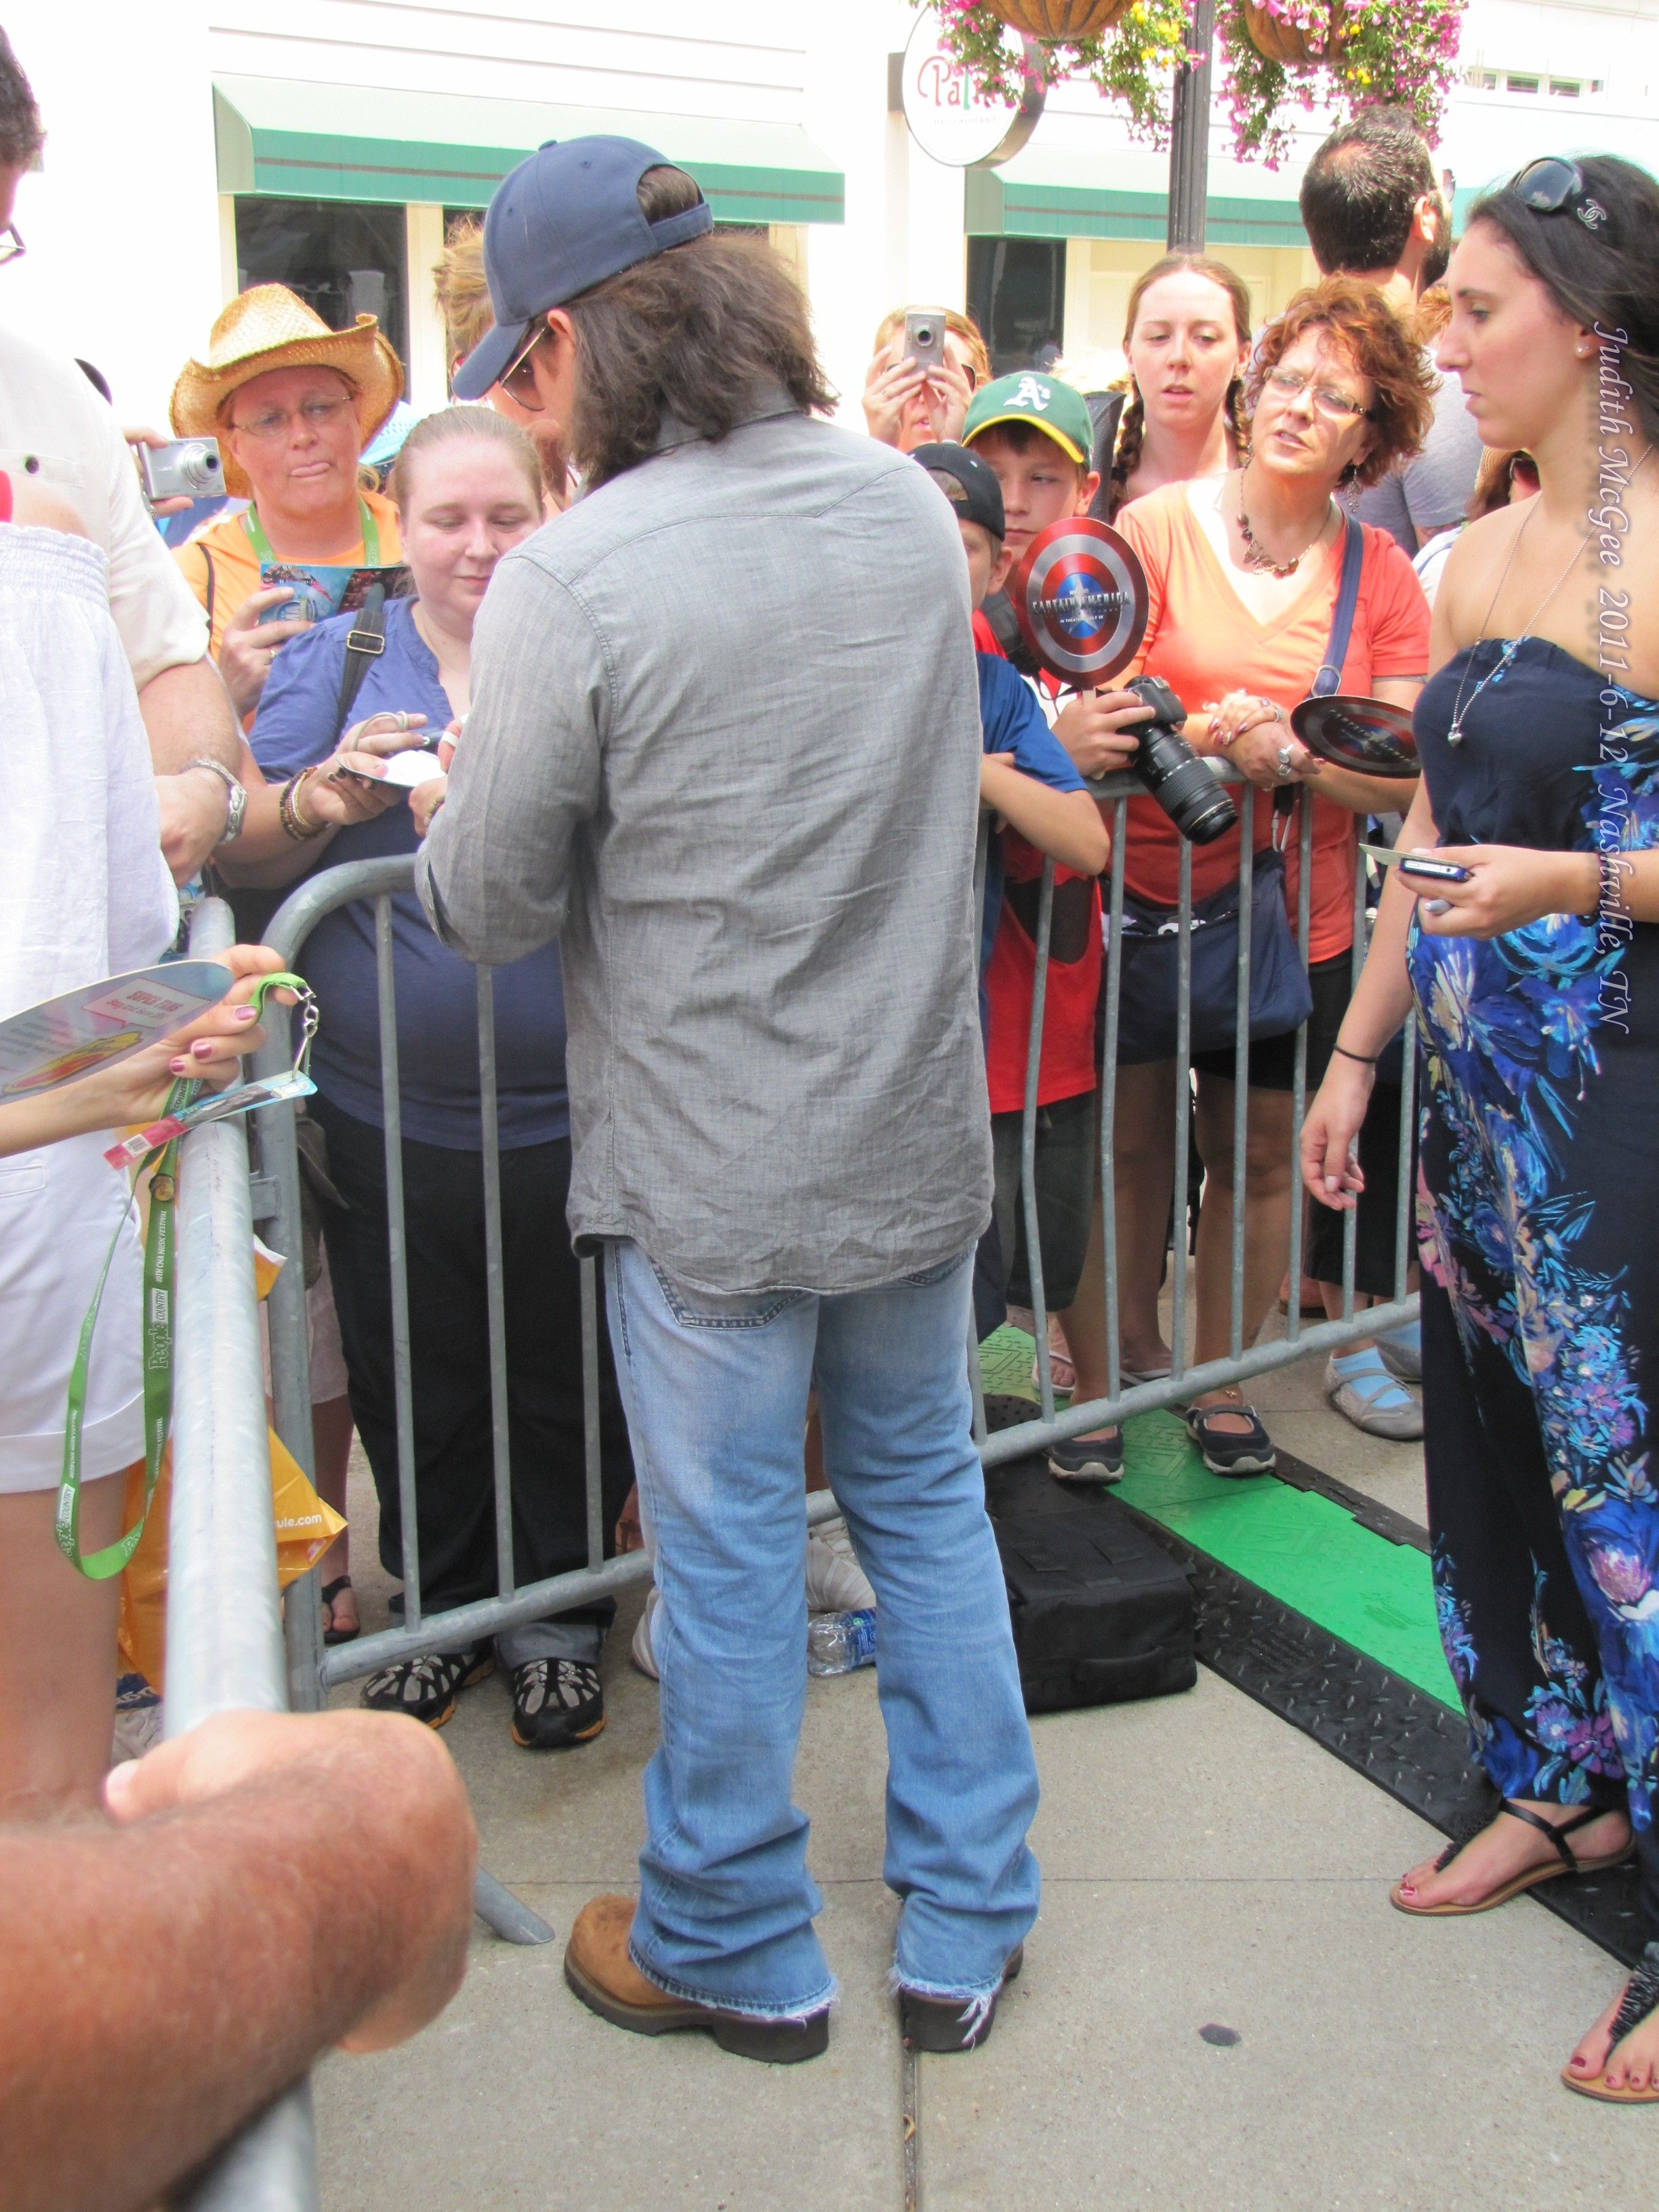 Christian Kane performing 2011-6-12 at CMA Music Fest, Nashville, TN. Photo by Judith McGee (Armybrat6683)